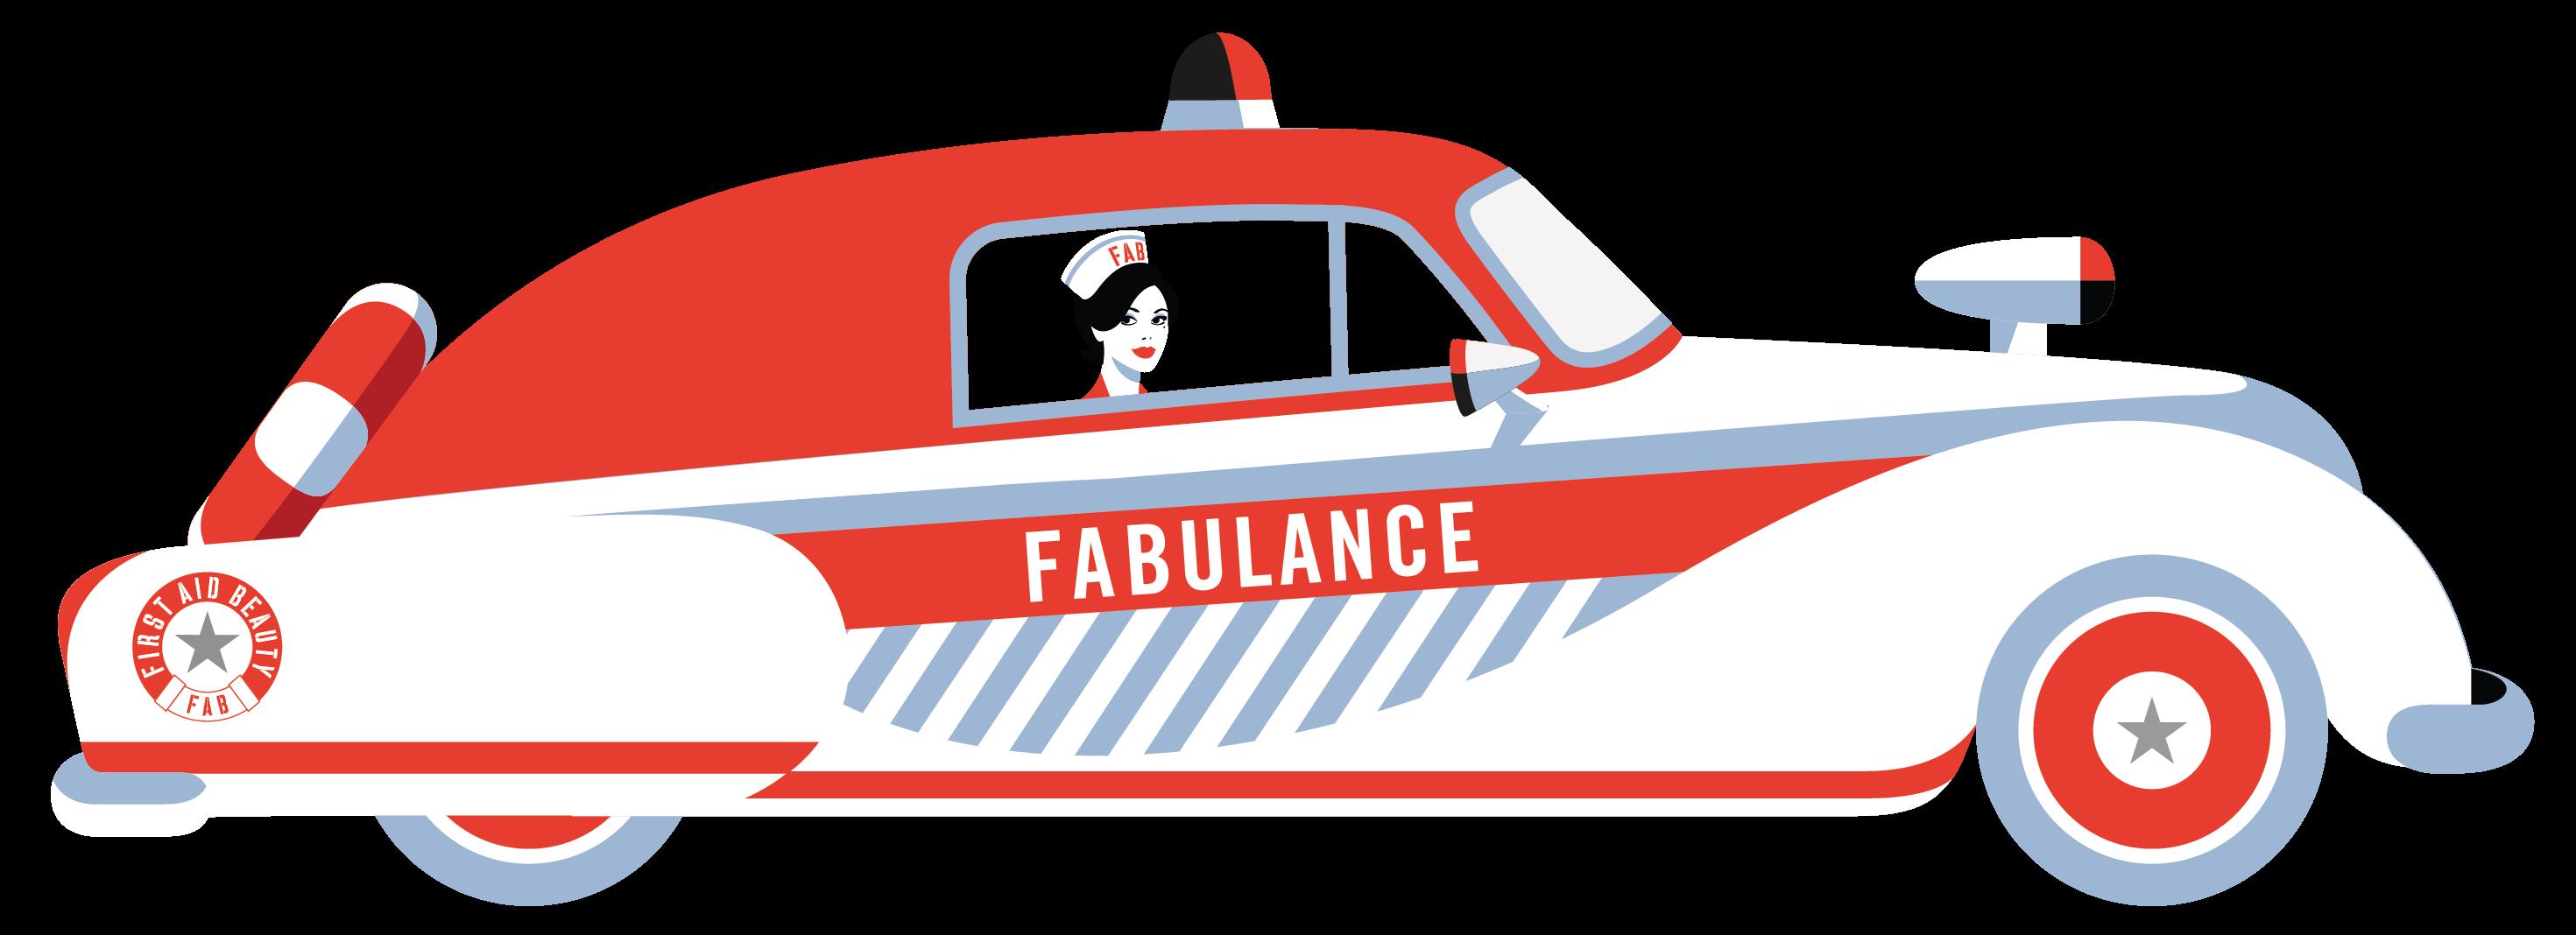 Fabulance